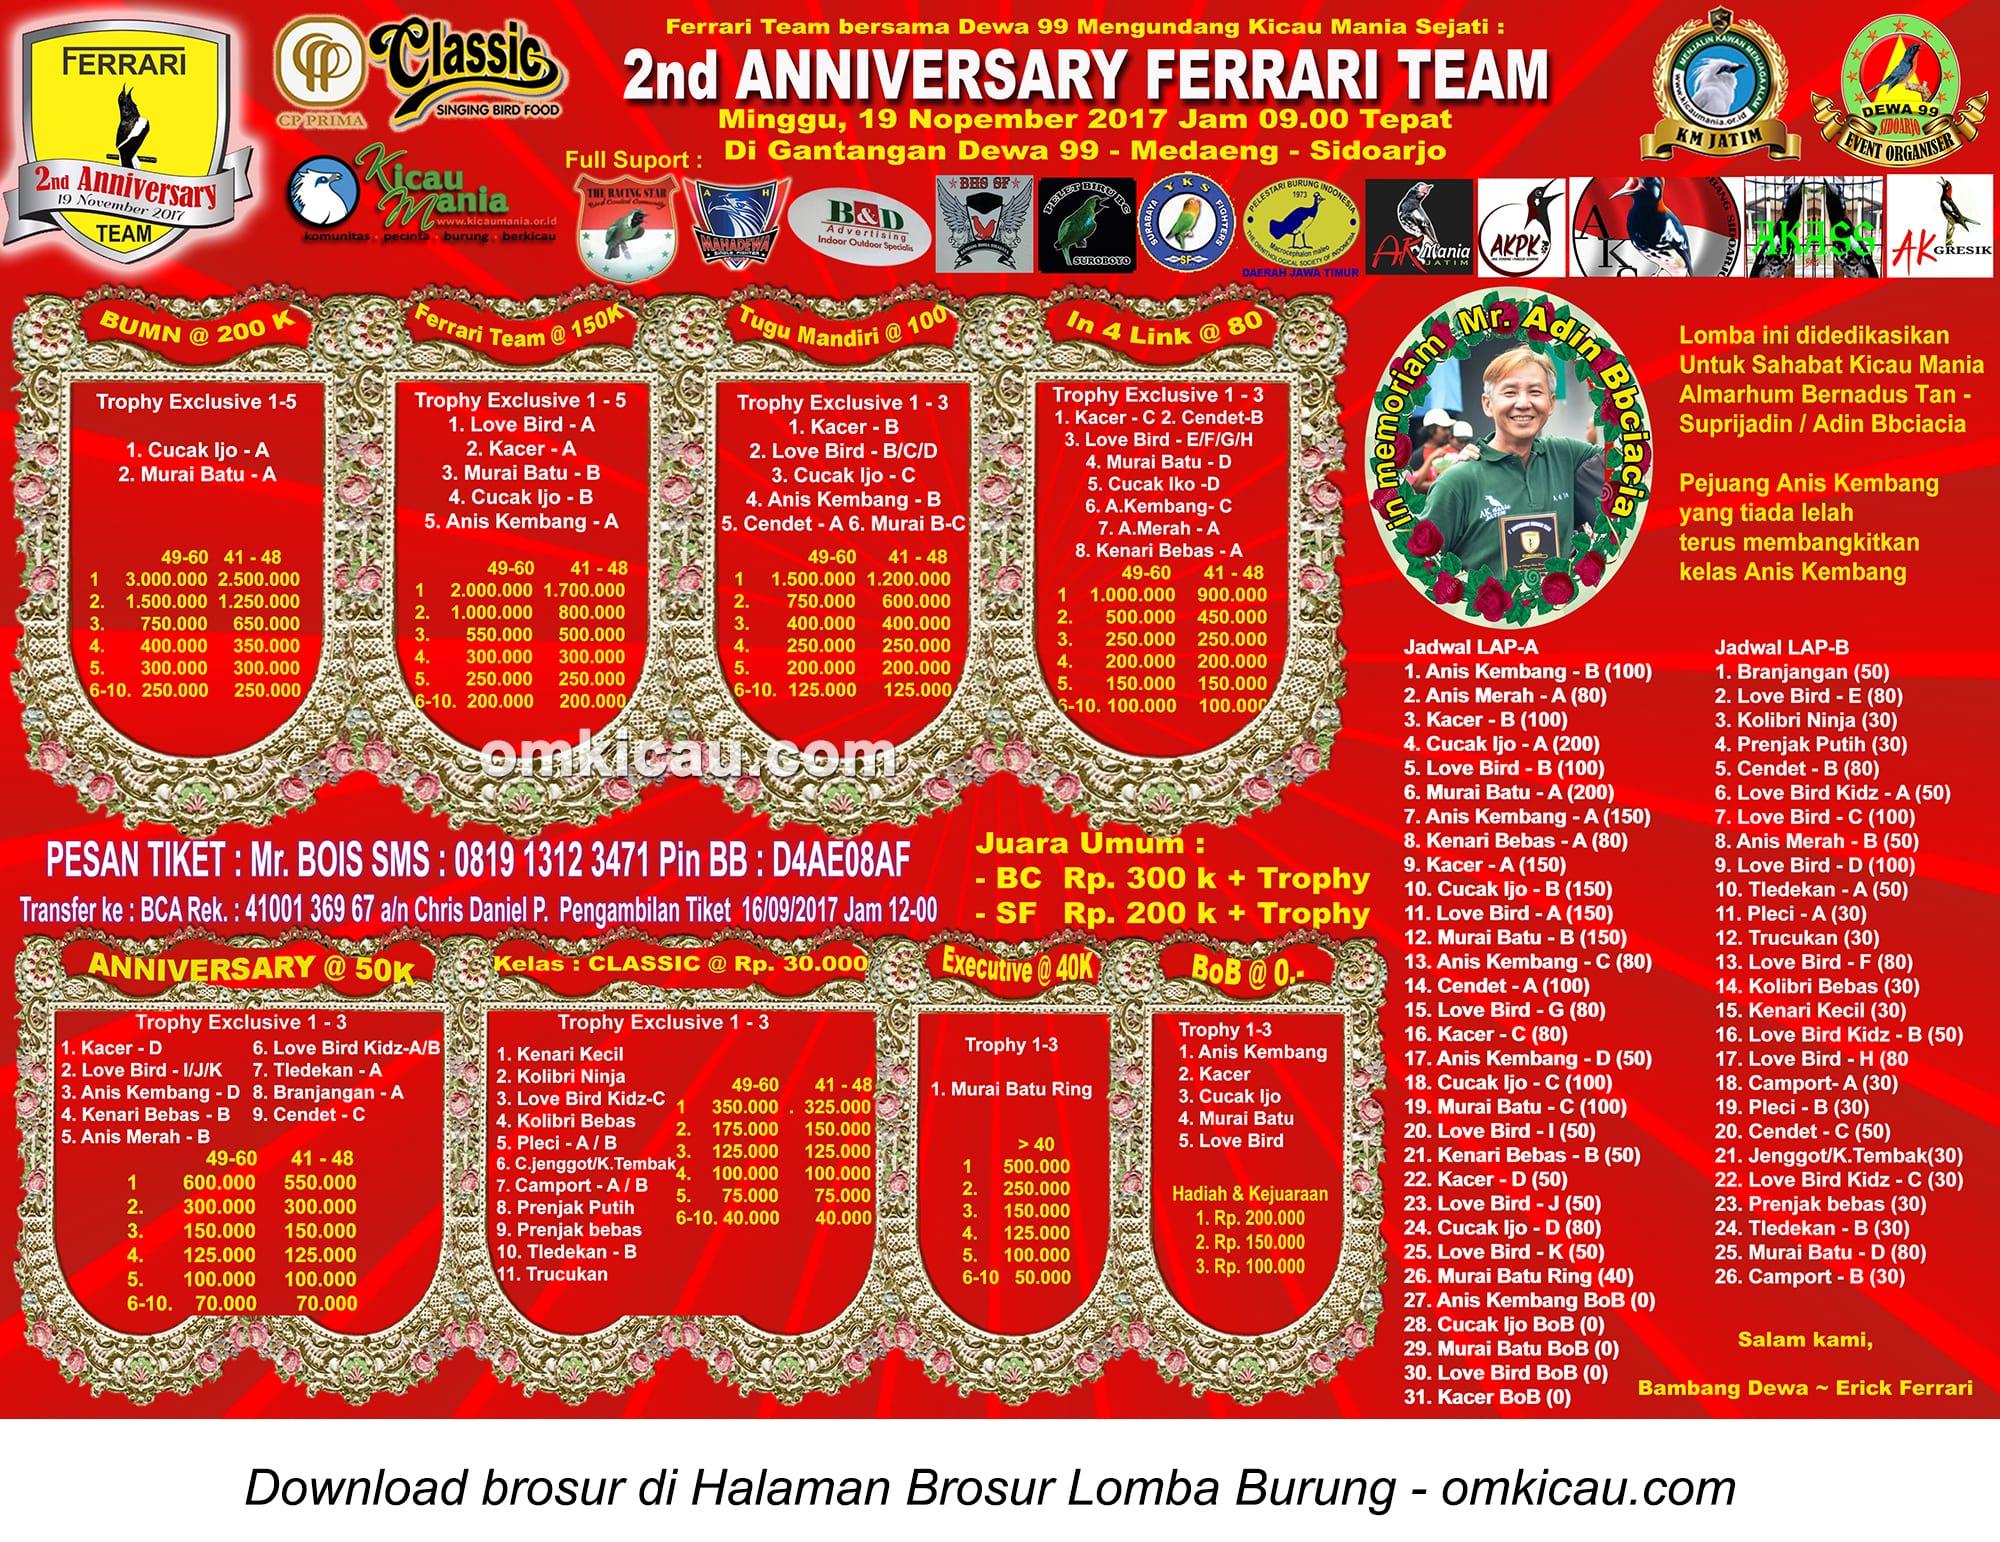 2nd Anniversary Ferrari Team